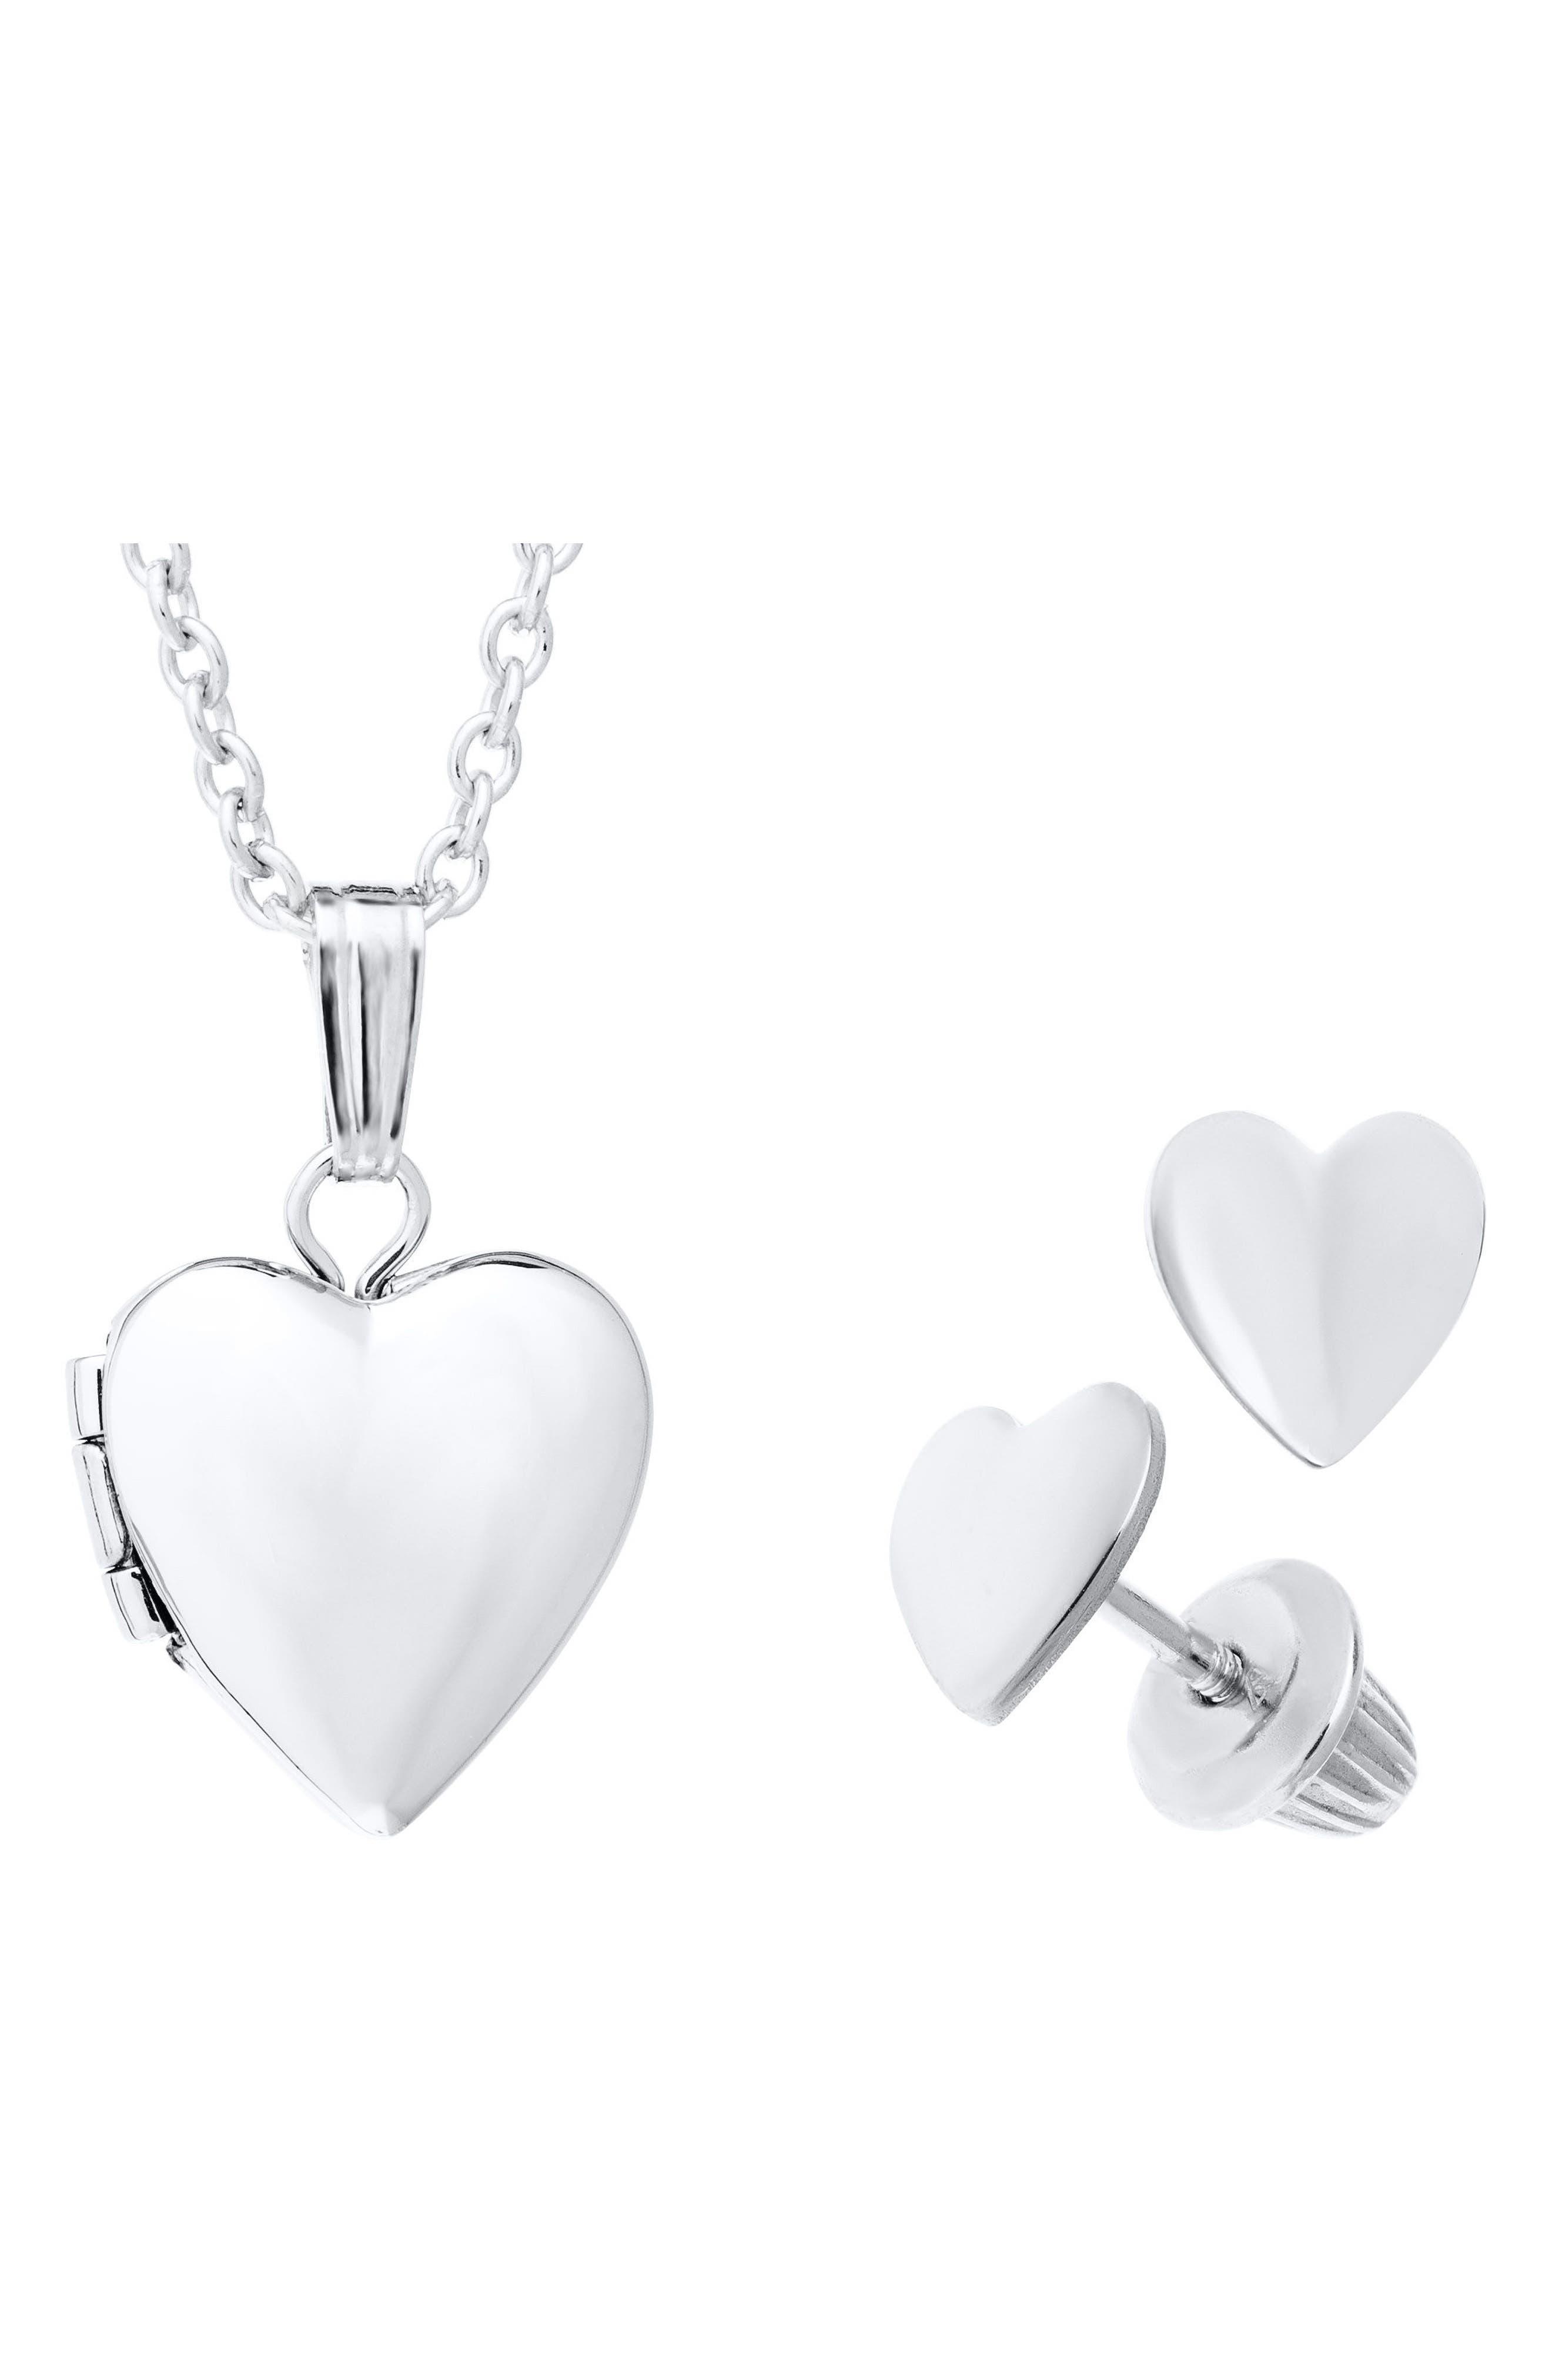 Main Image - Mignonette Sterling Silver Heart Locket Necklace & Earrings Set (Girls)